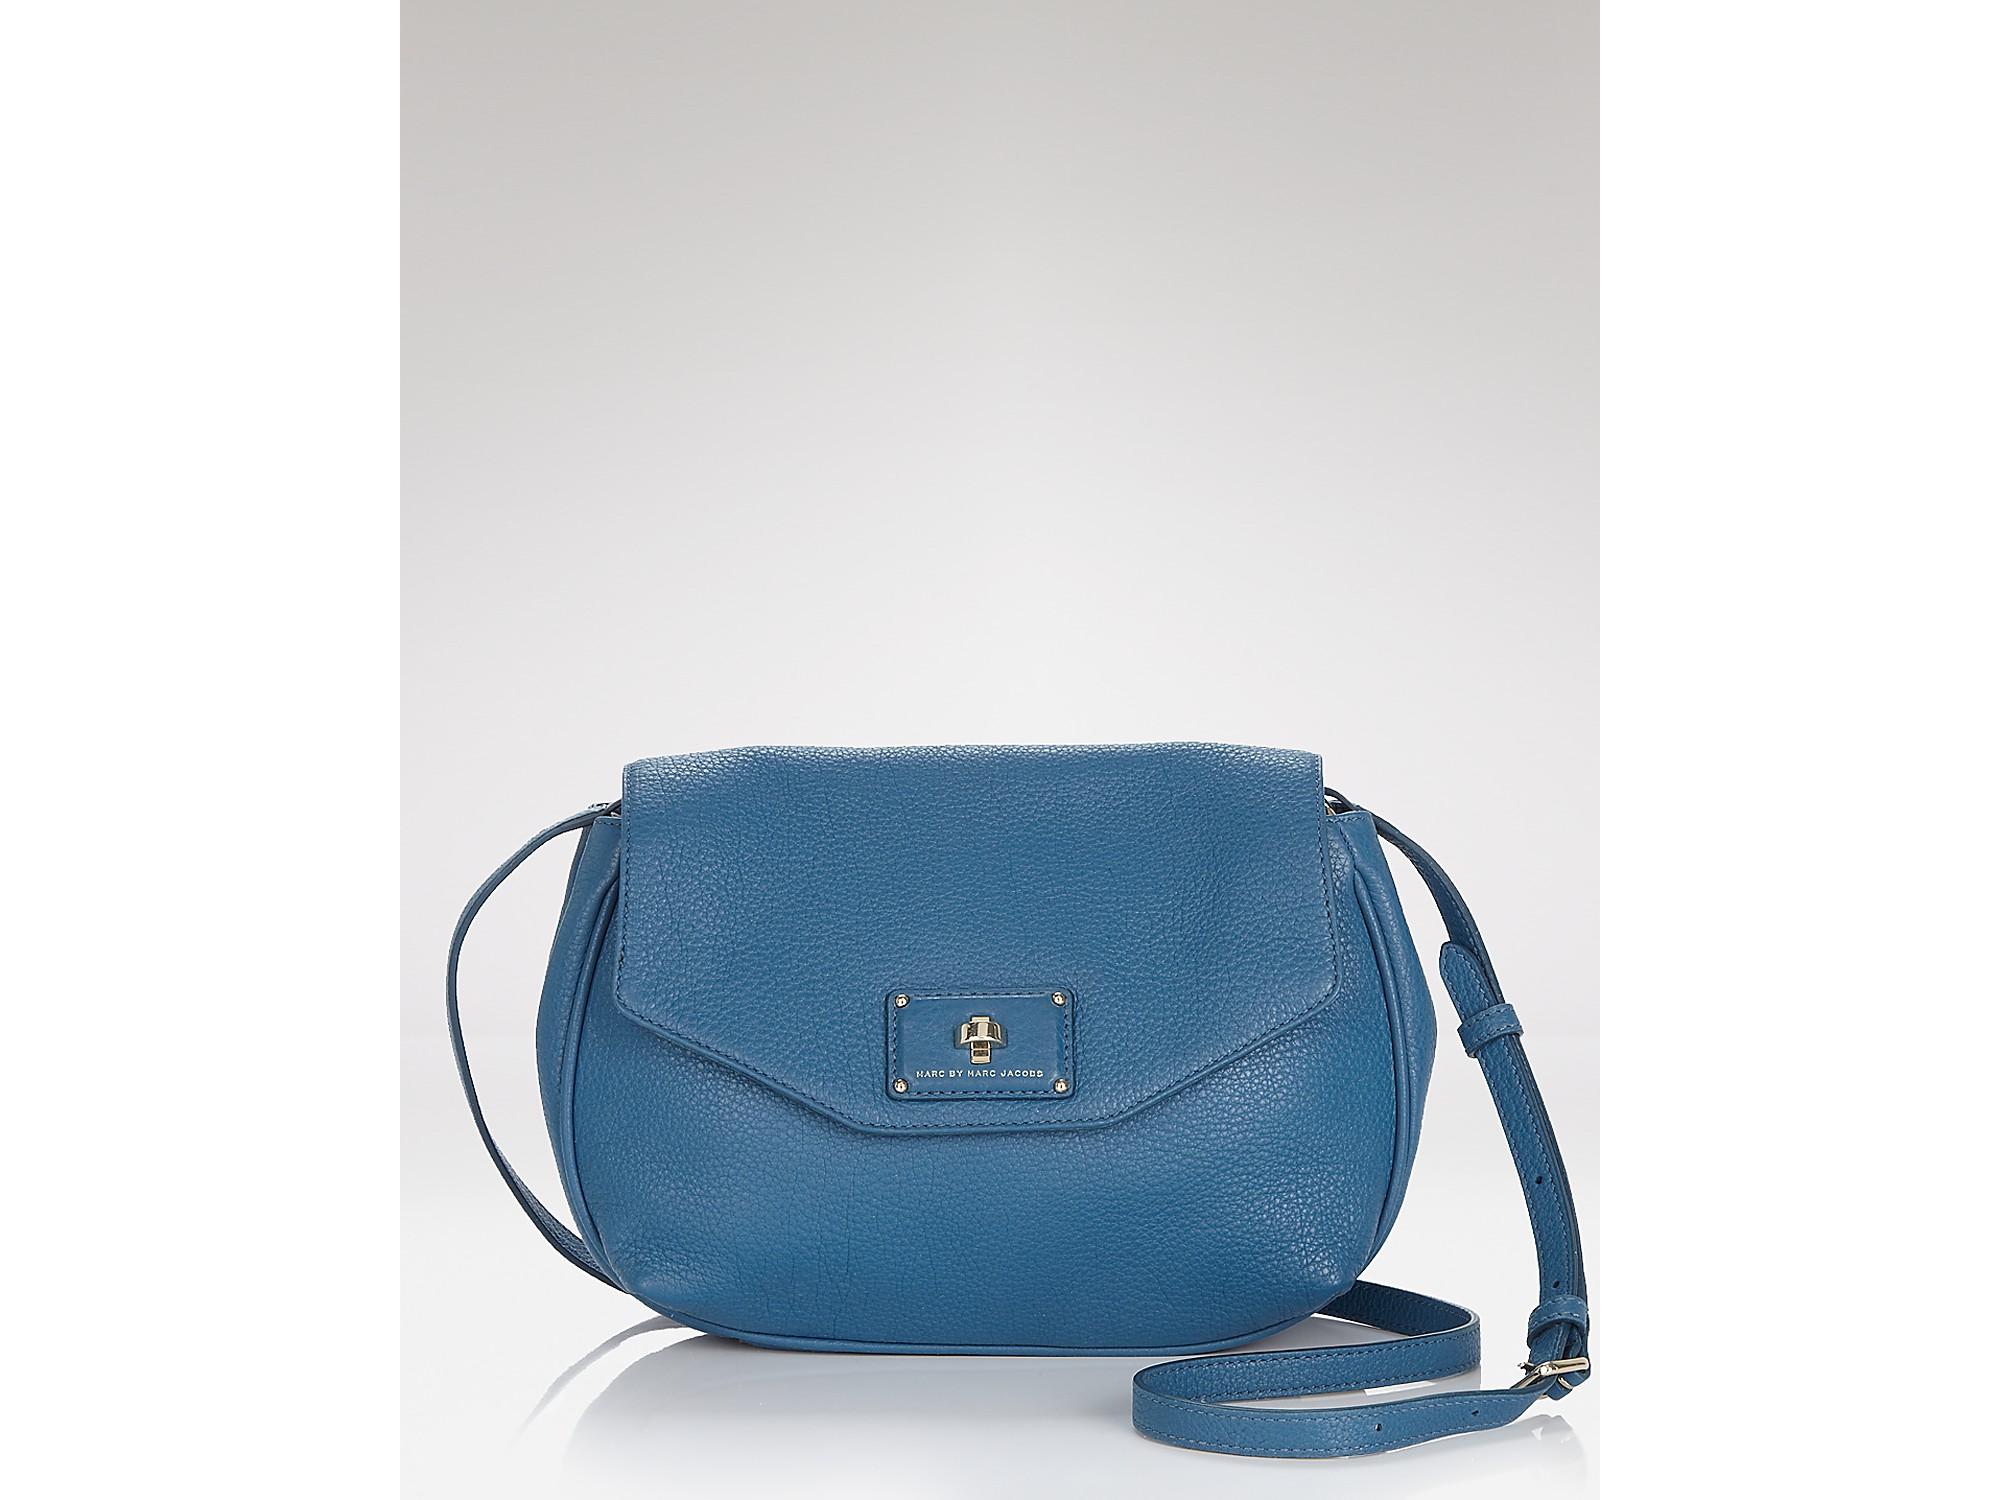 3533c9354b27 Lyst - Marc By Marc Jacobs Les Zeppelin Flap Crossbody Bag in Blue